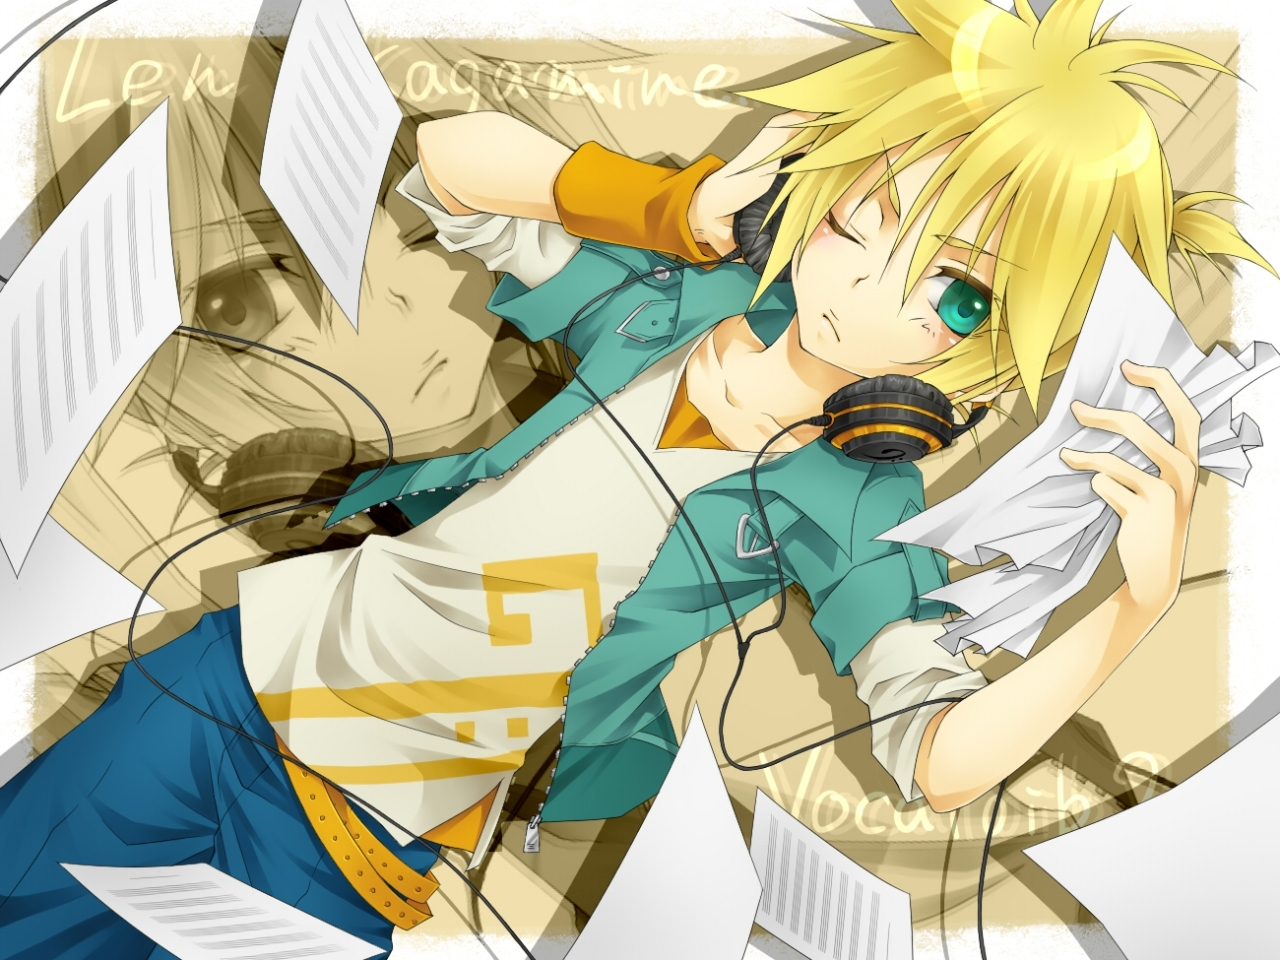 Brown hair anime boy with headphones